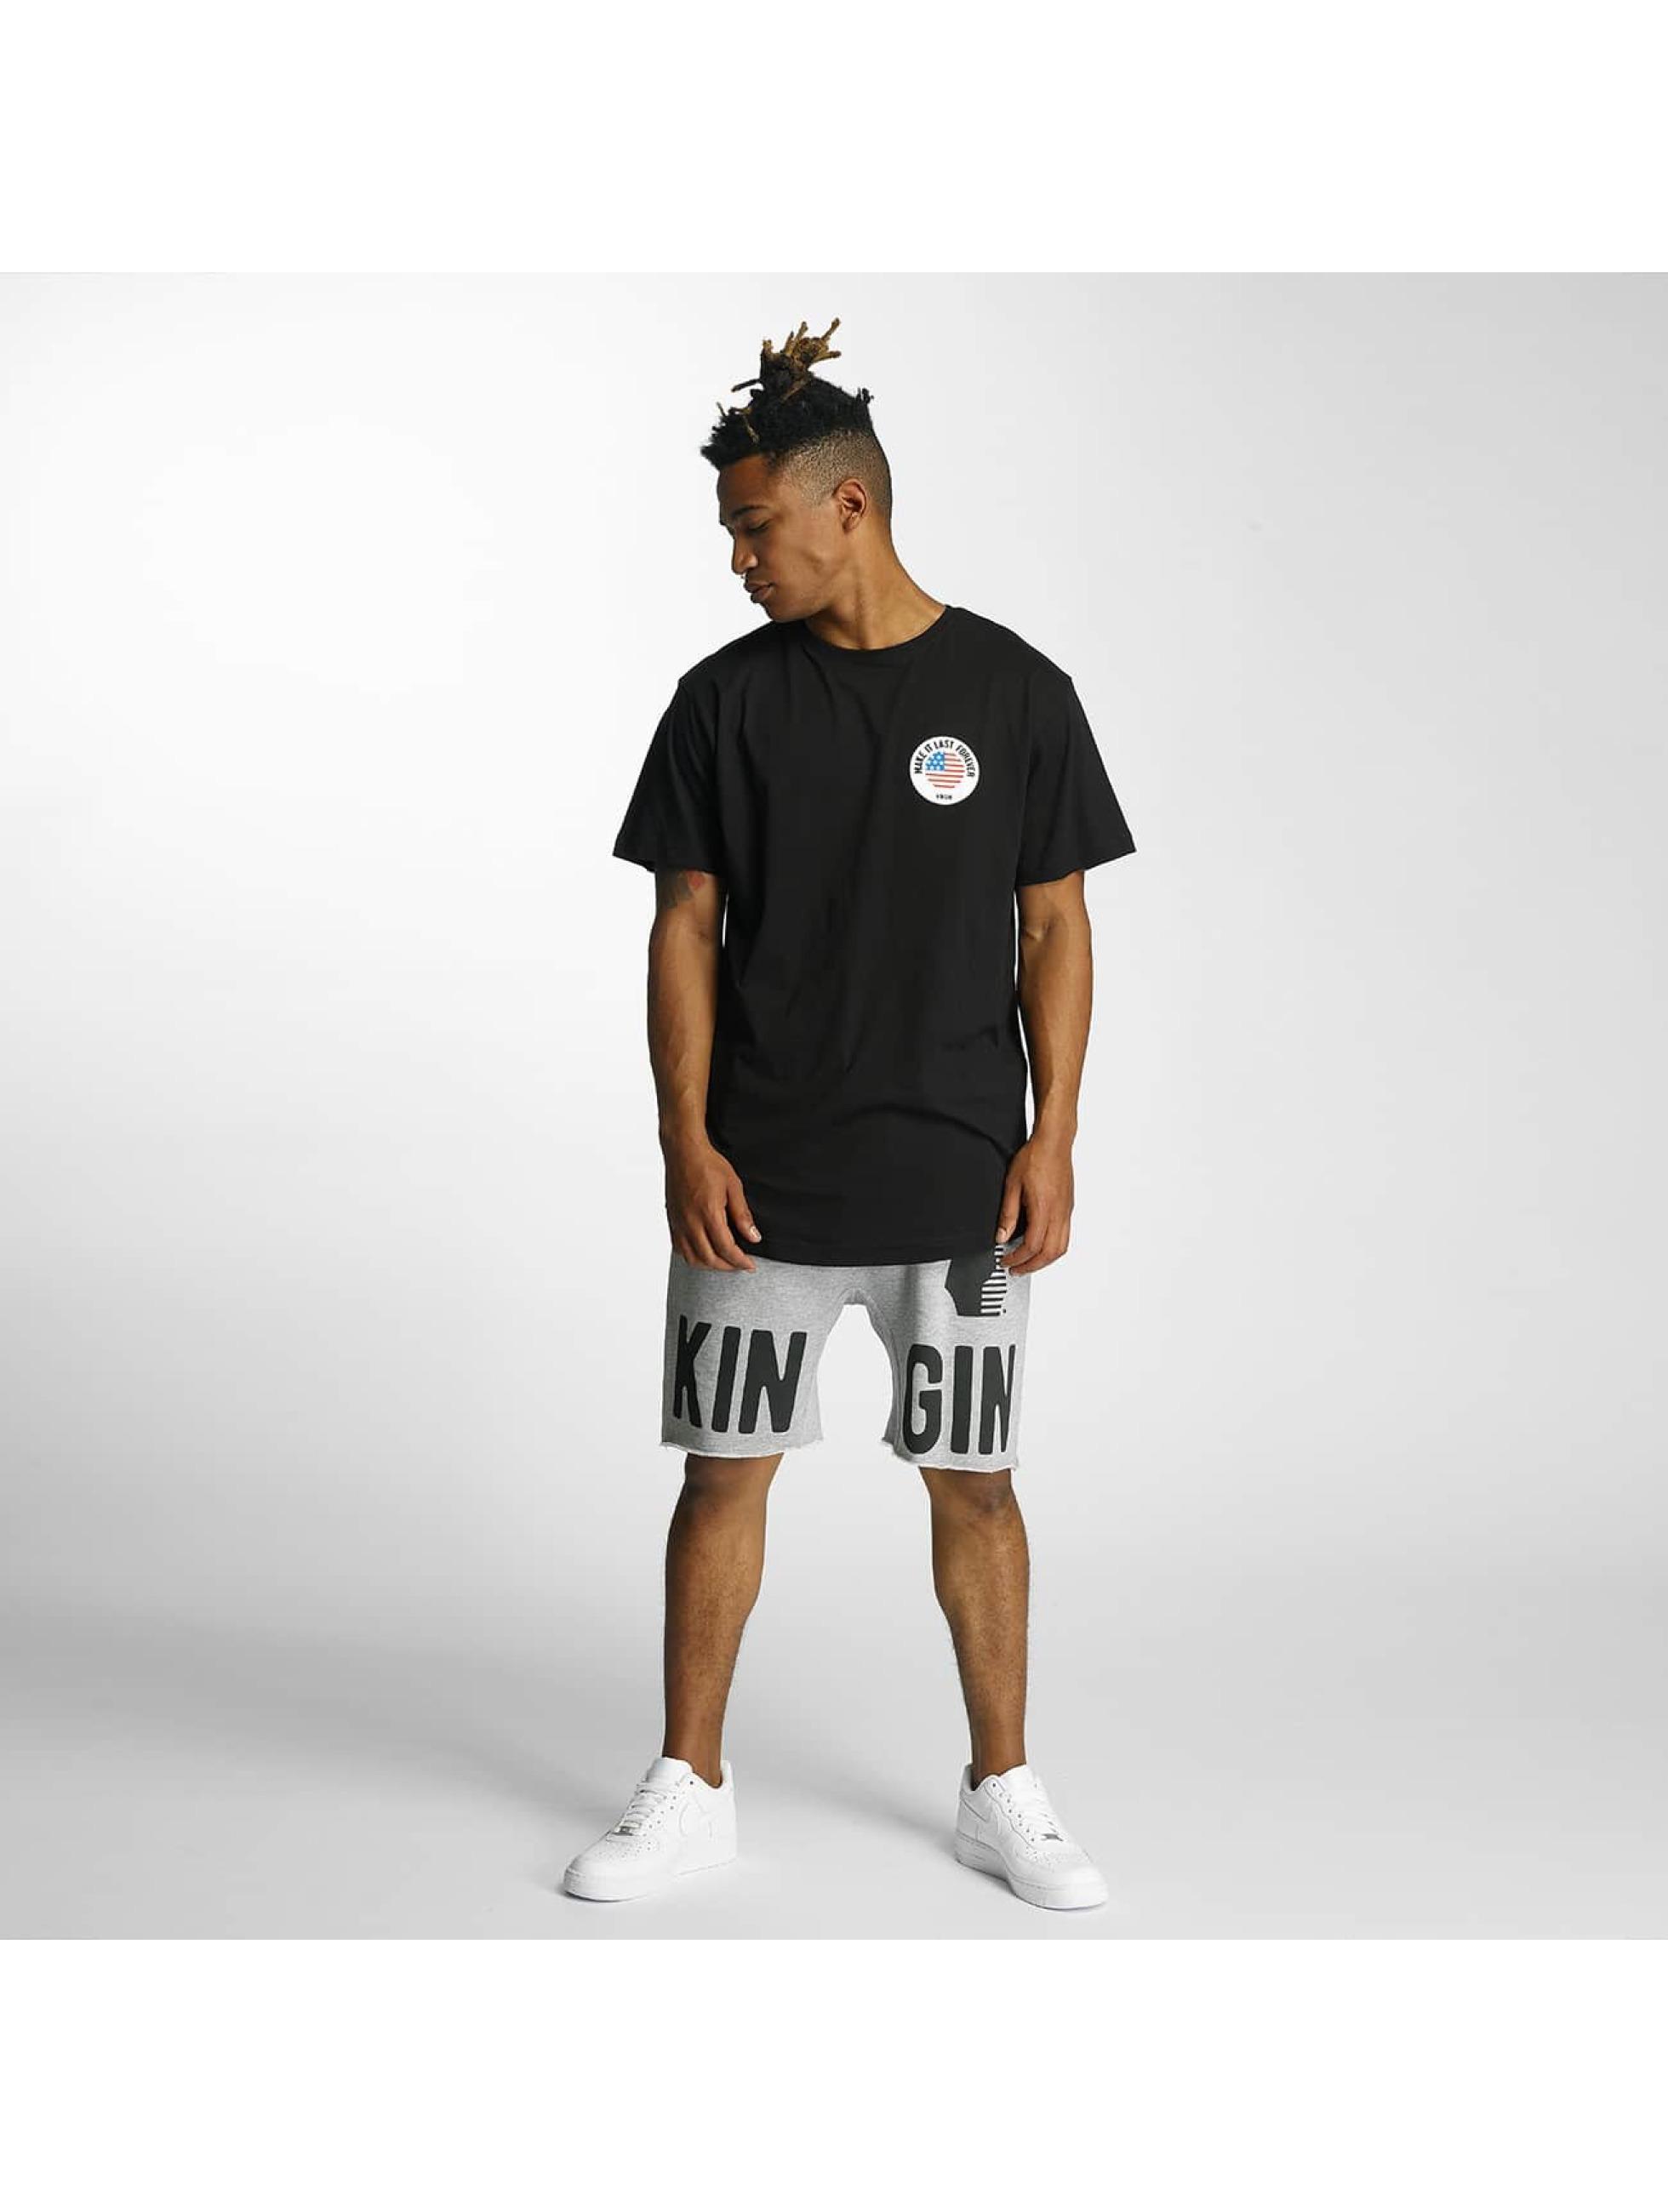 Kingin T-Shirt Melrose schwarz